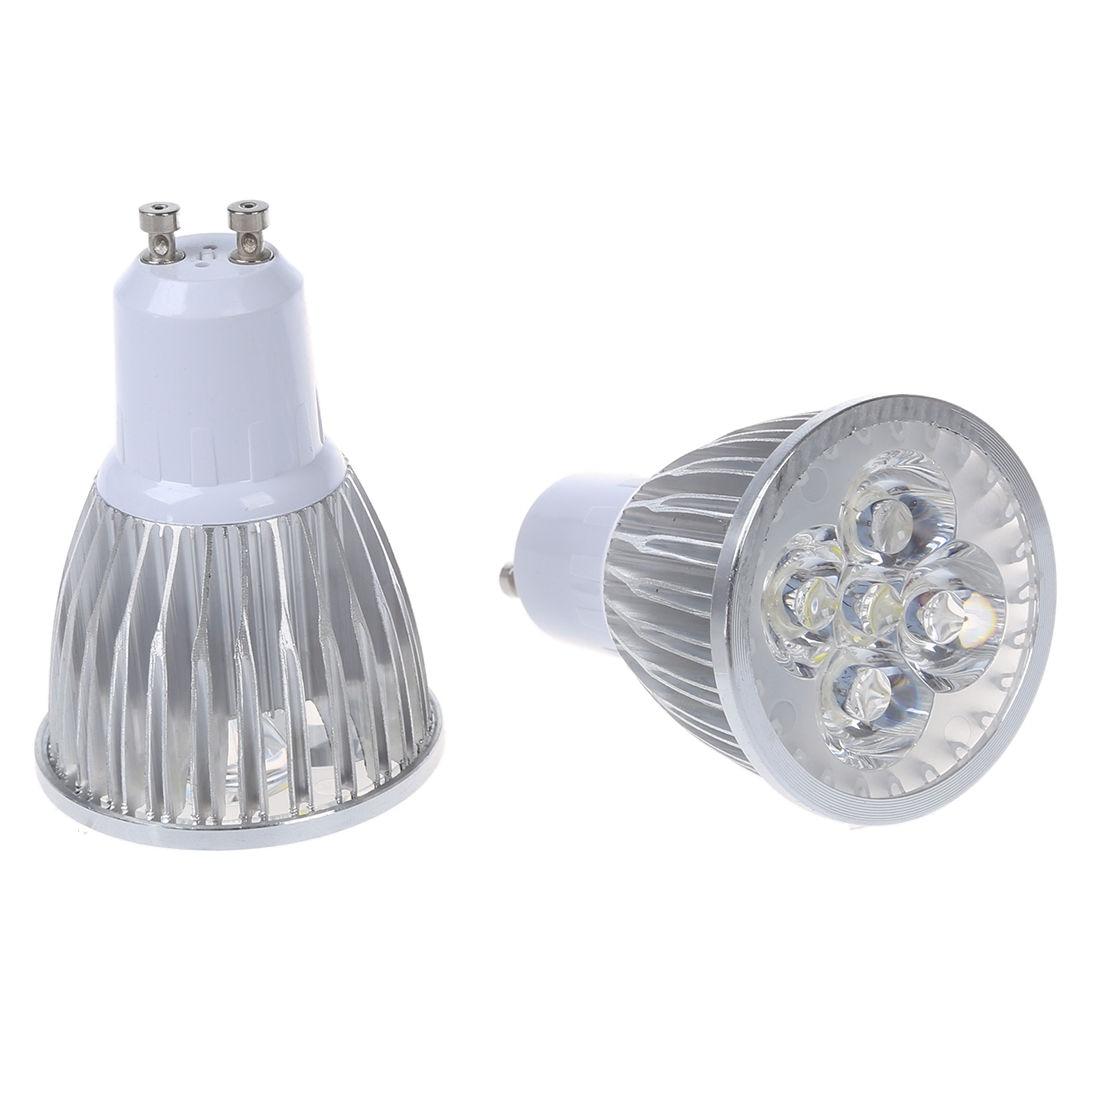 10 x 5W GU10 5 LED GU10 LED Bulb LED Light Bulb Cold White LED 450-Lumen AC95-240V